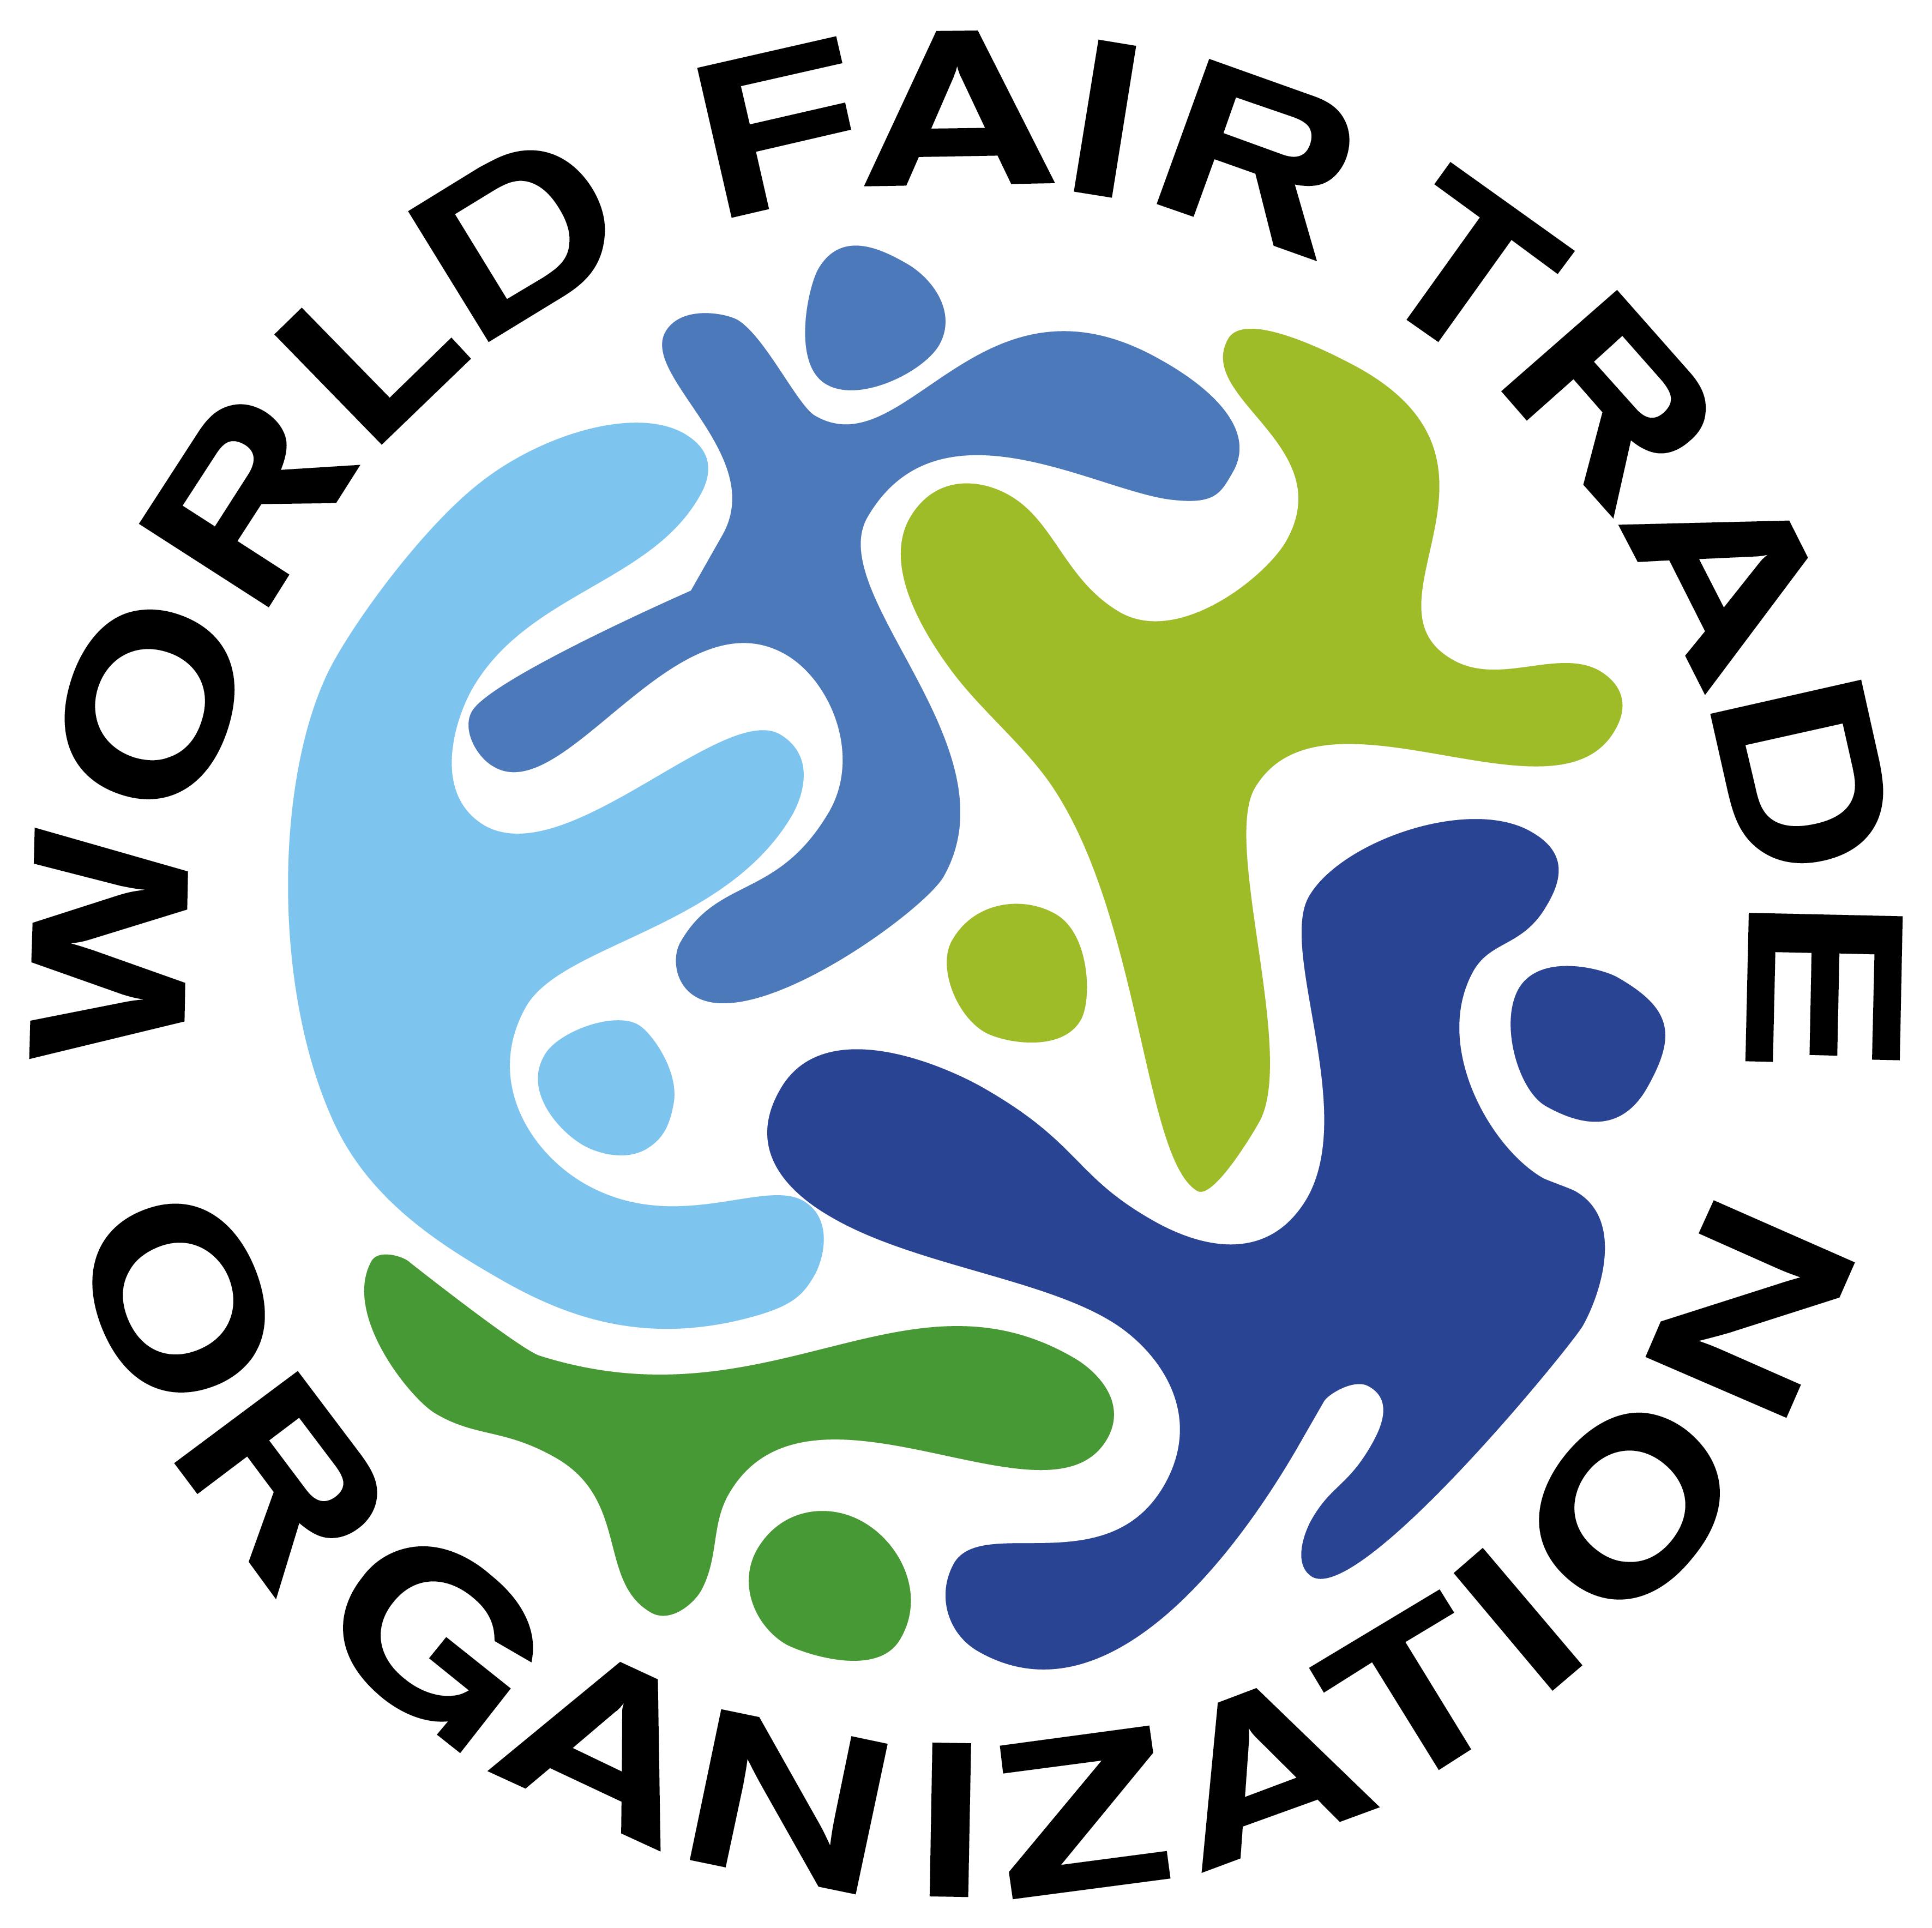 Fair trade » Danyun